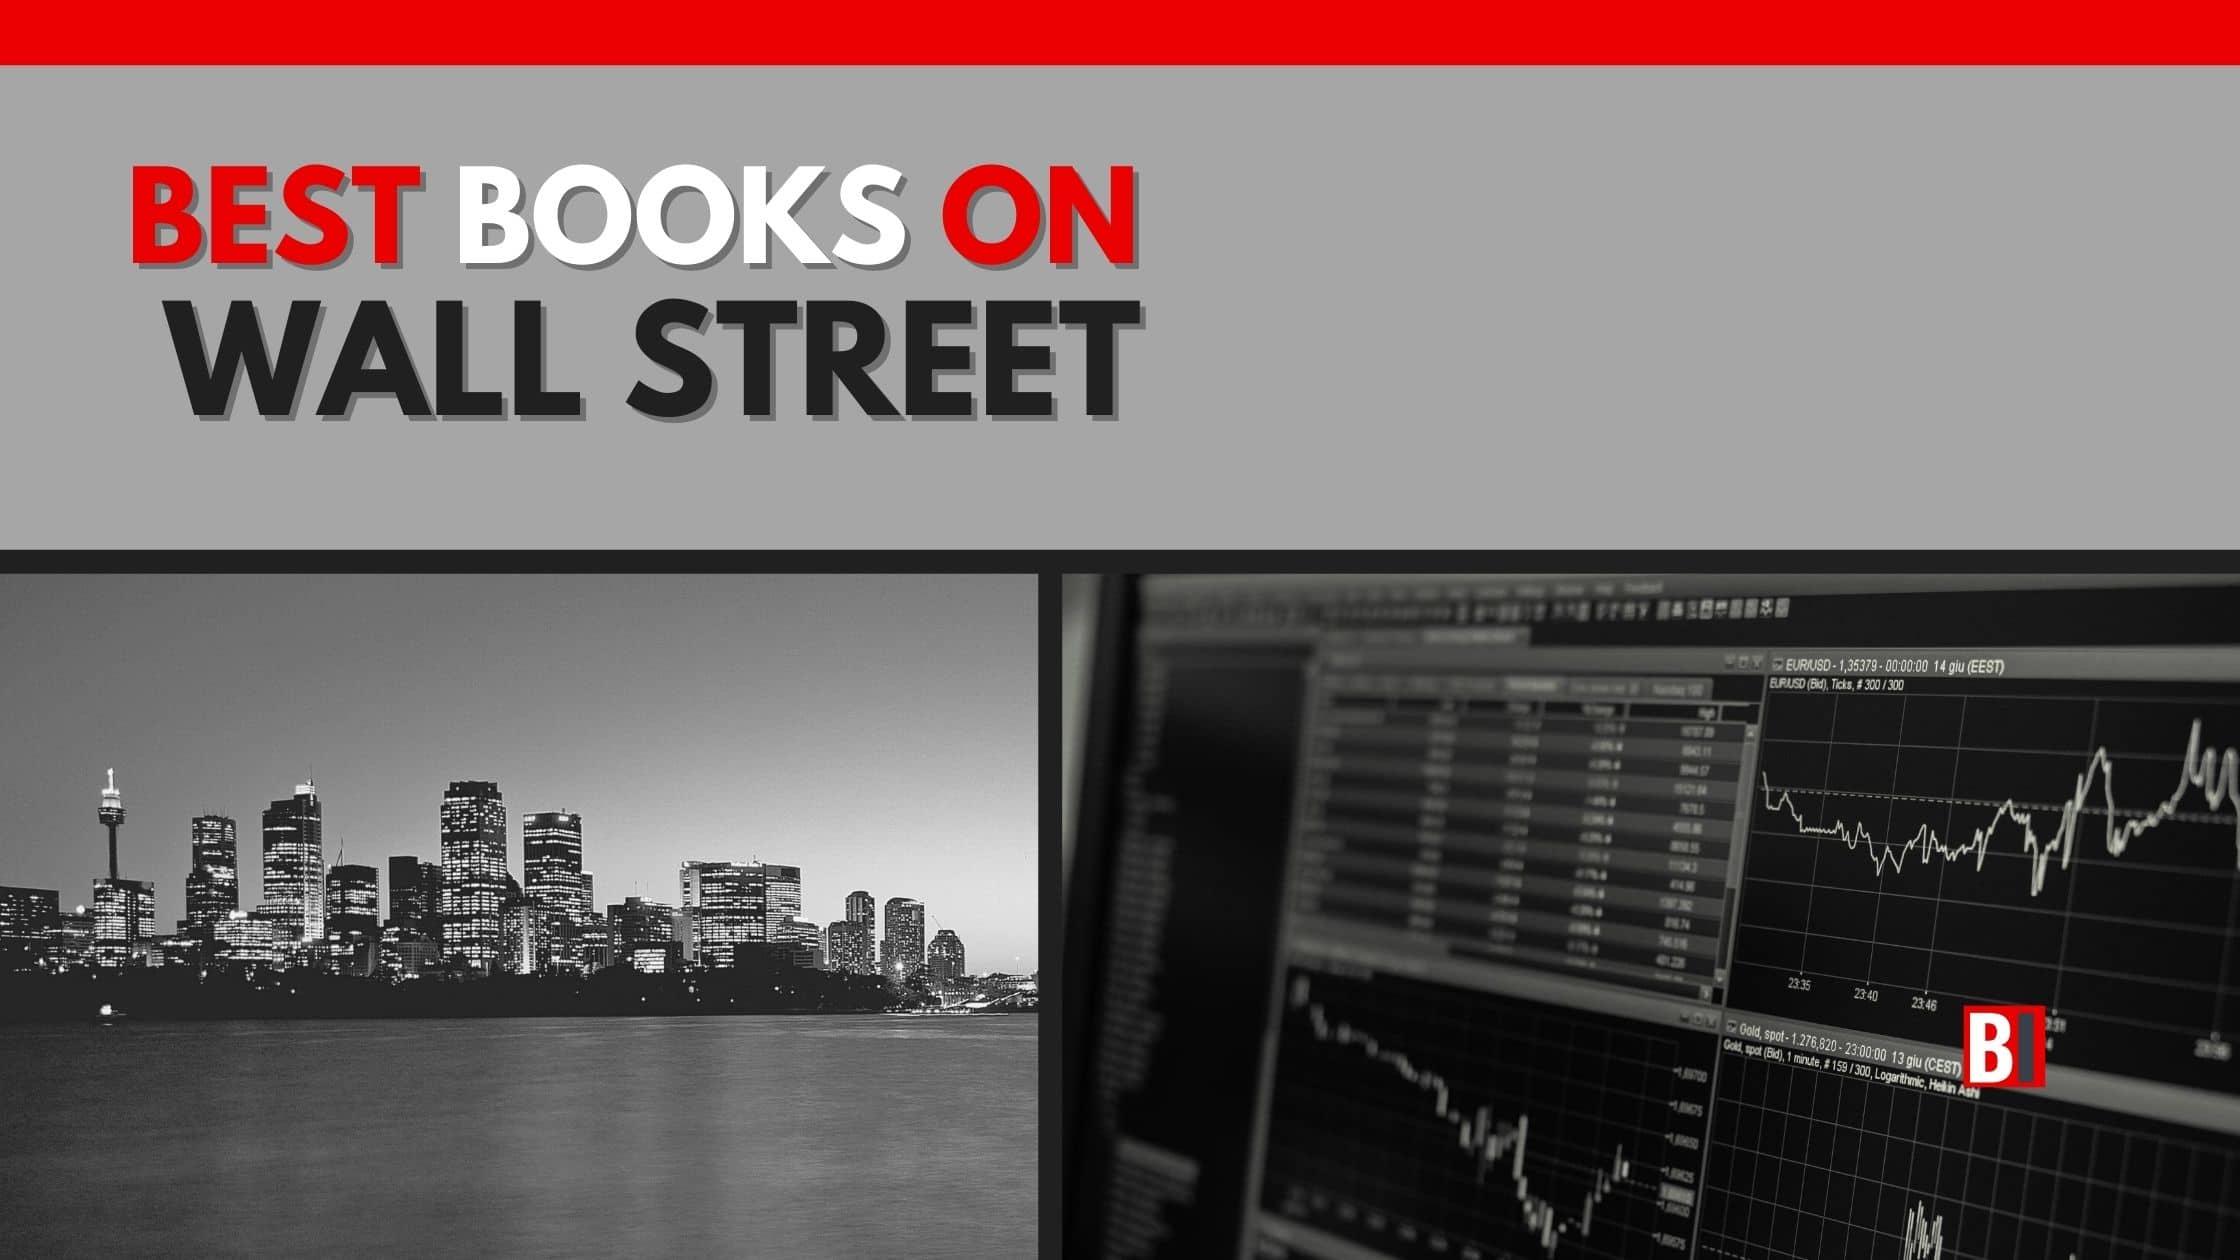 Best Books on Wall Street